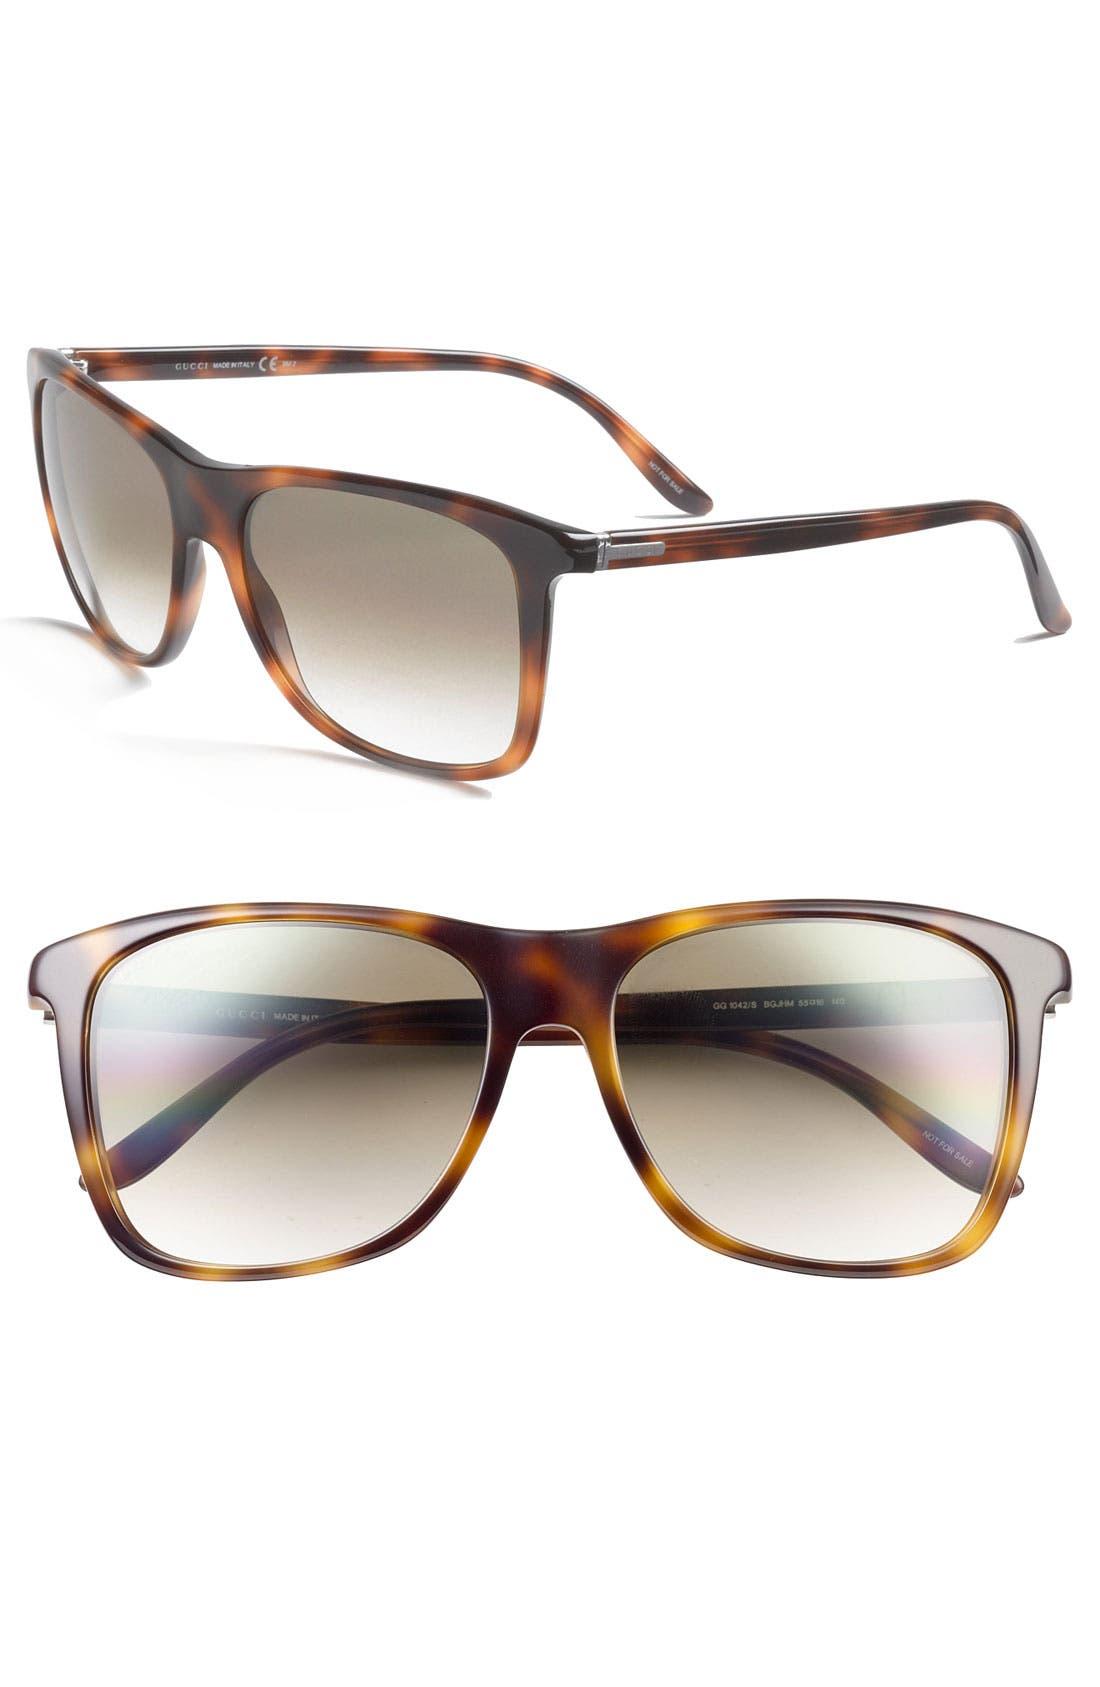 Alternate Image 1 Selected - Gucci Rectangular 55mm Sunglasses